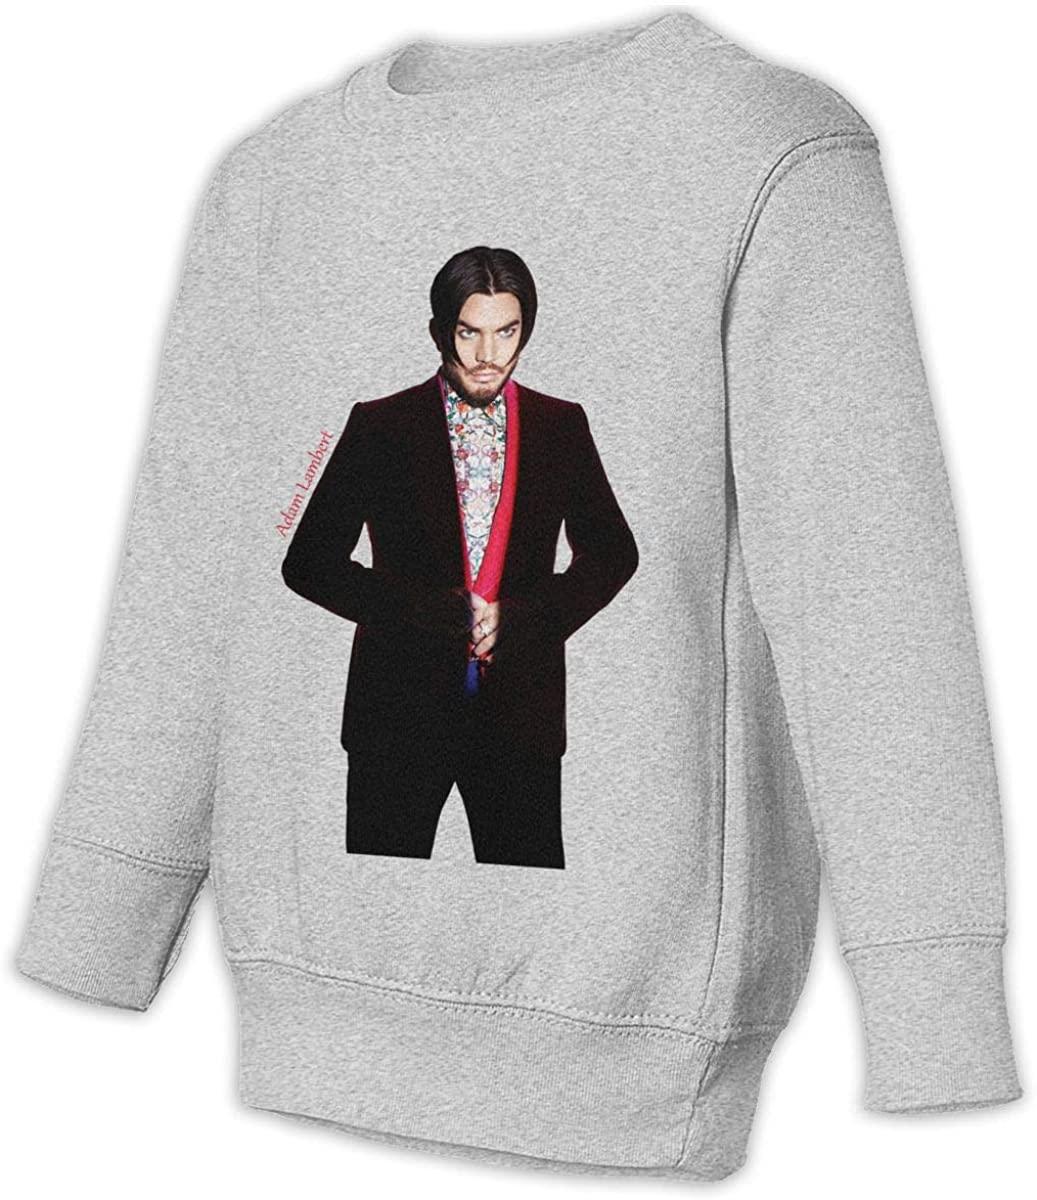 BodiGulick Adam Lambert Boys and Girls Sweatshirts, Cotton Sports Tops Sweatshirt Black